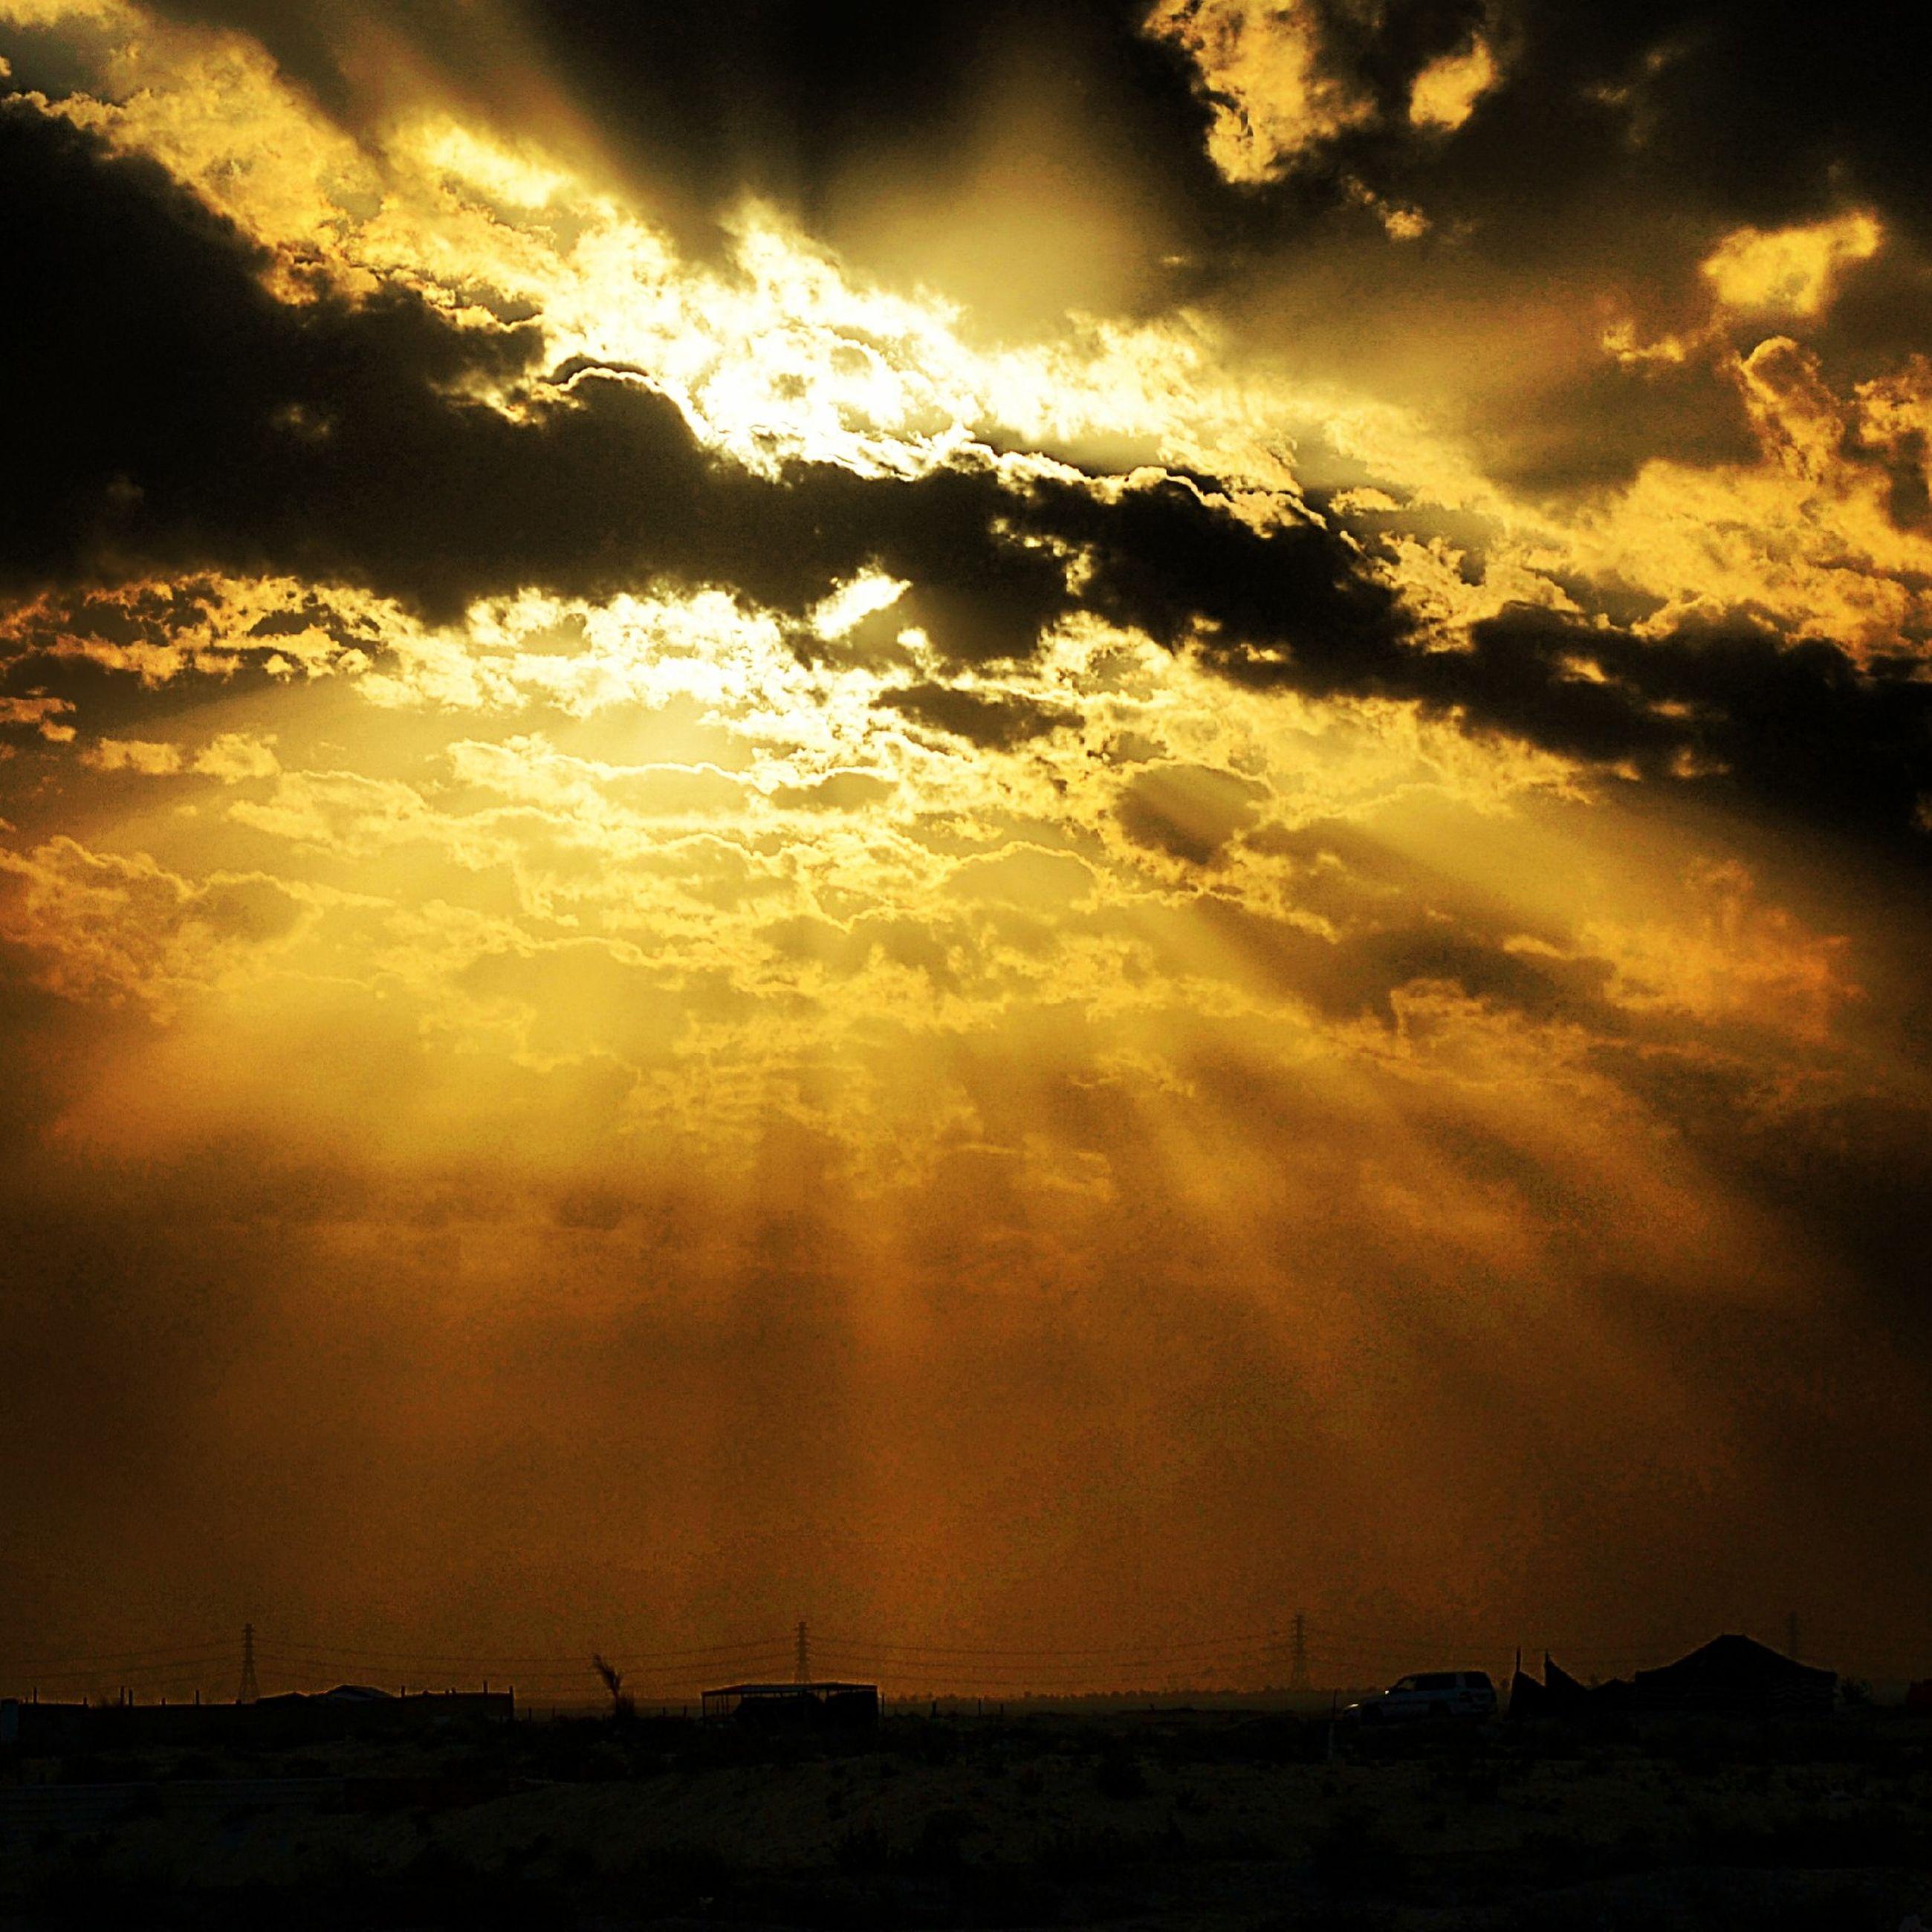 sunset, sky, scenics, cloud - sky, beauty in nature, tranquil scene, orange color, silhouette, tranquility, dramatic sky, idyllic, nature, cloudy, cloud, sun, atmospheric mood, landscape, moody sky, majestic, cloudscape